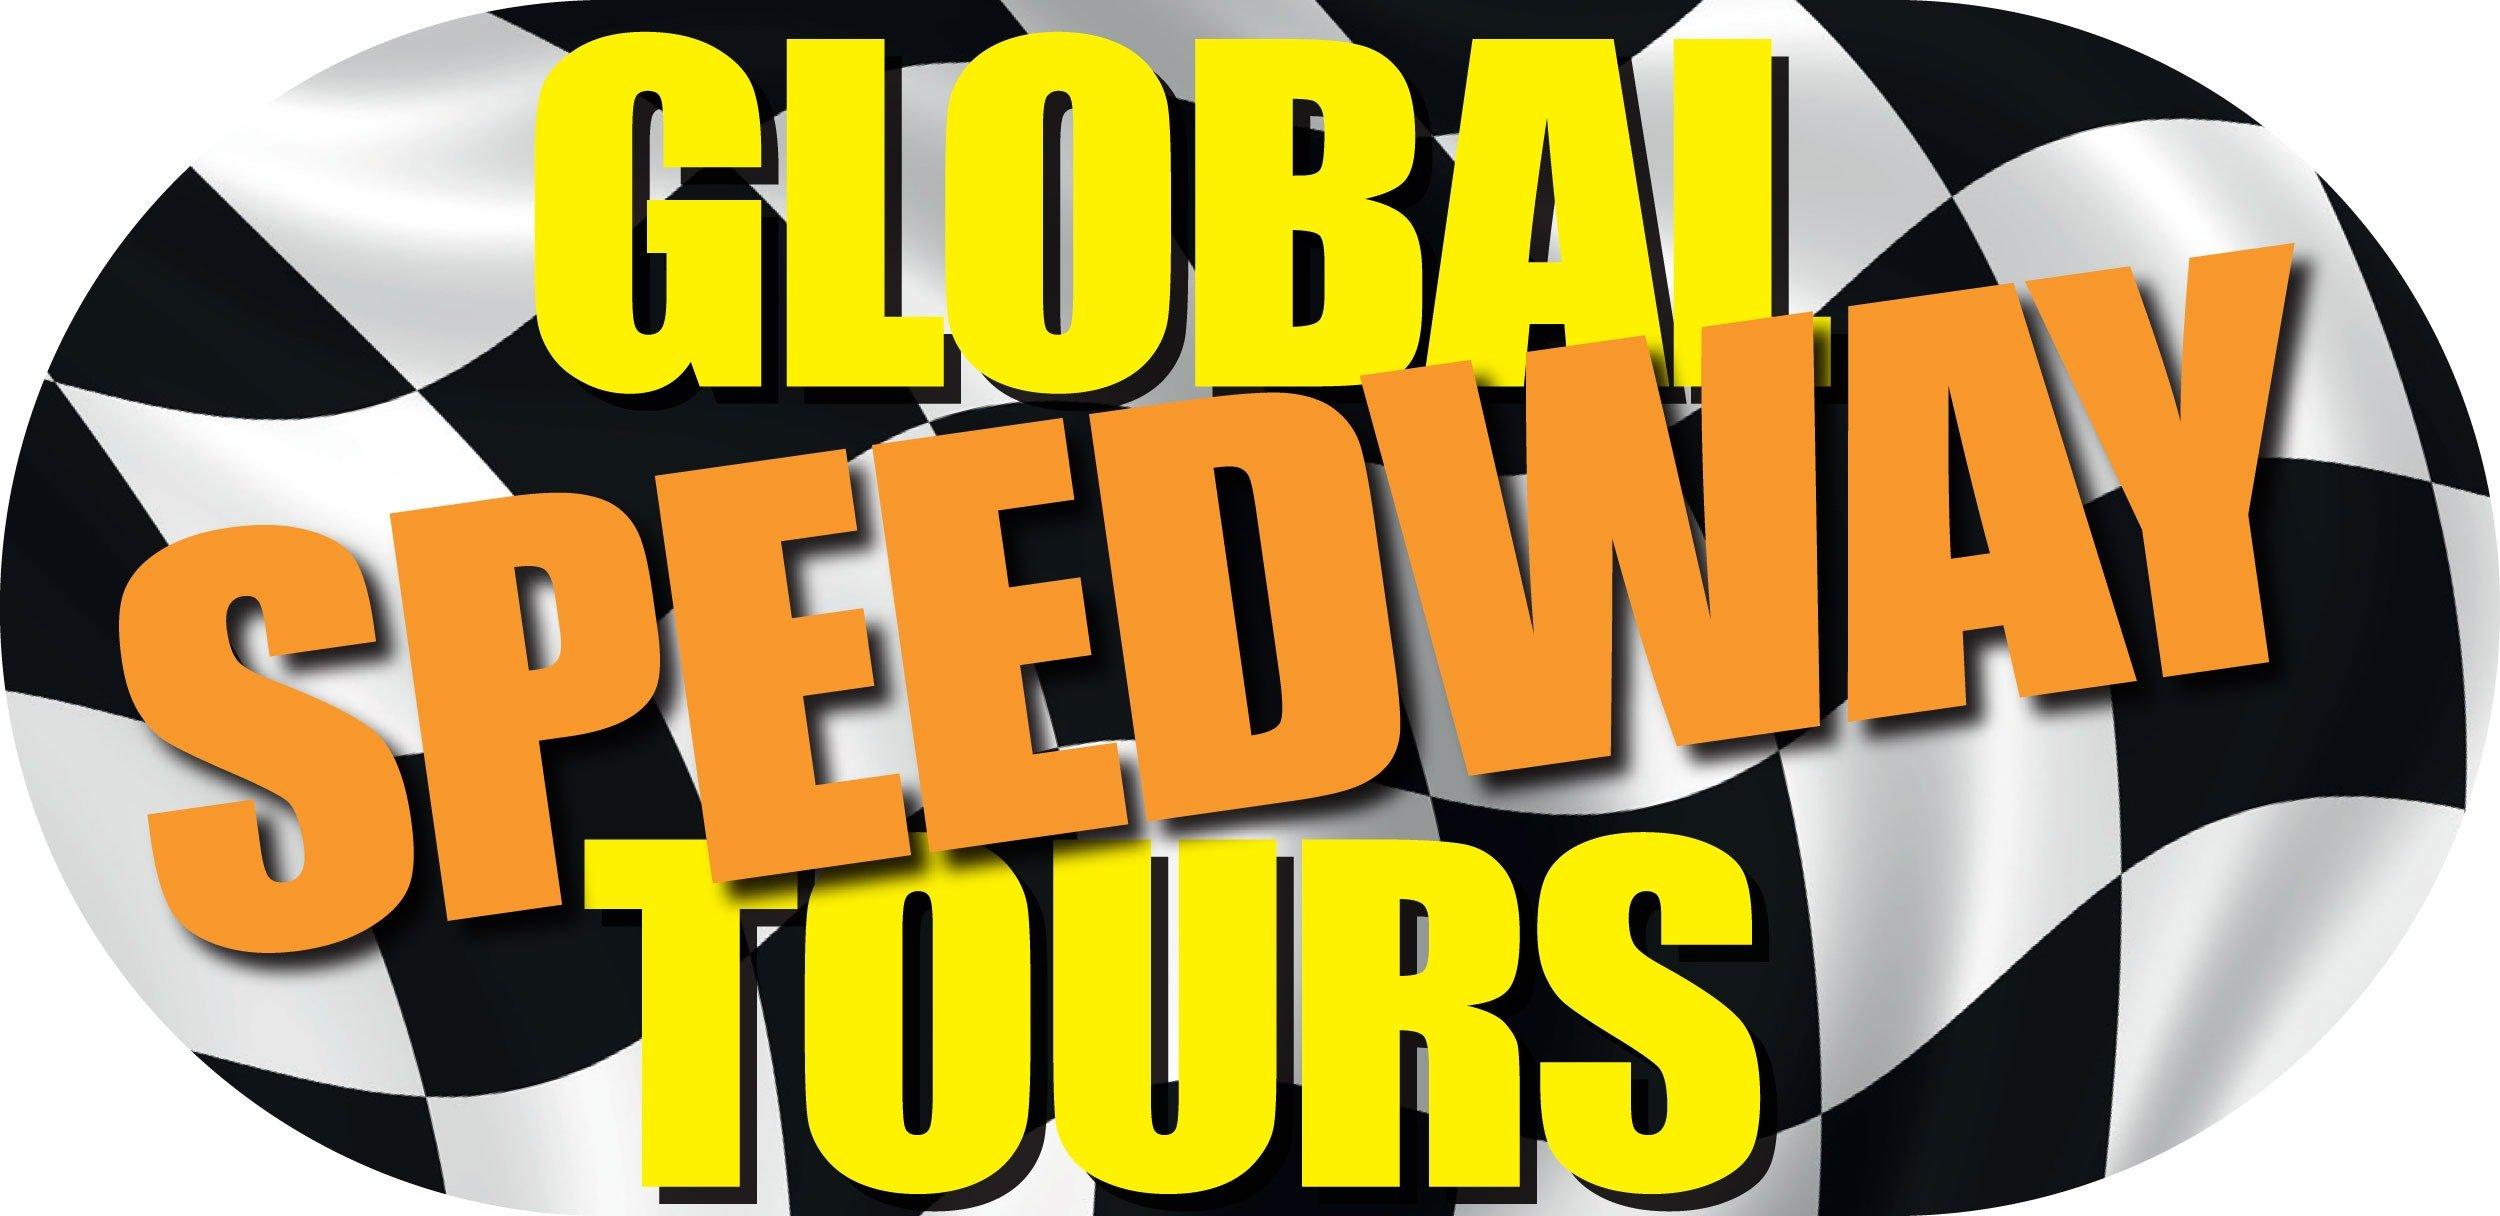 Global Speedway Tours